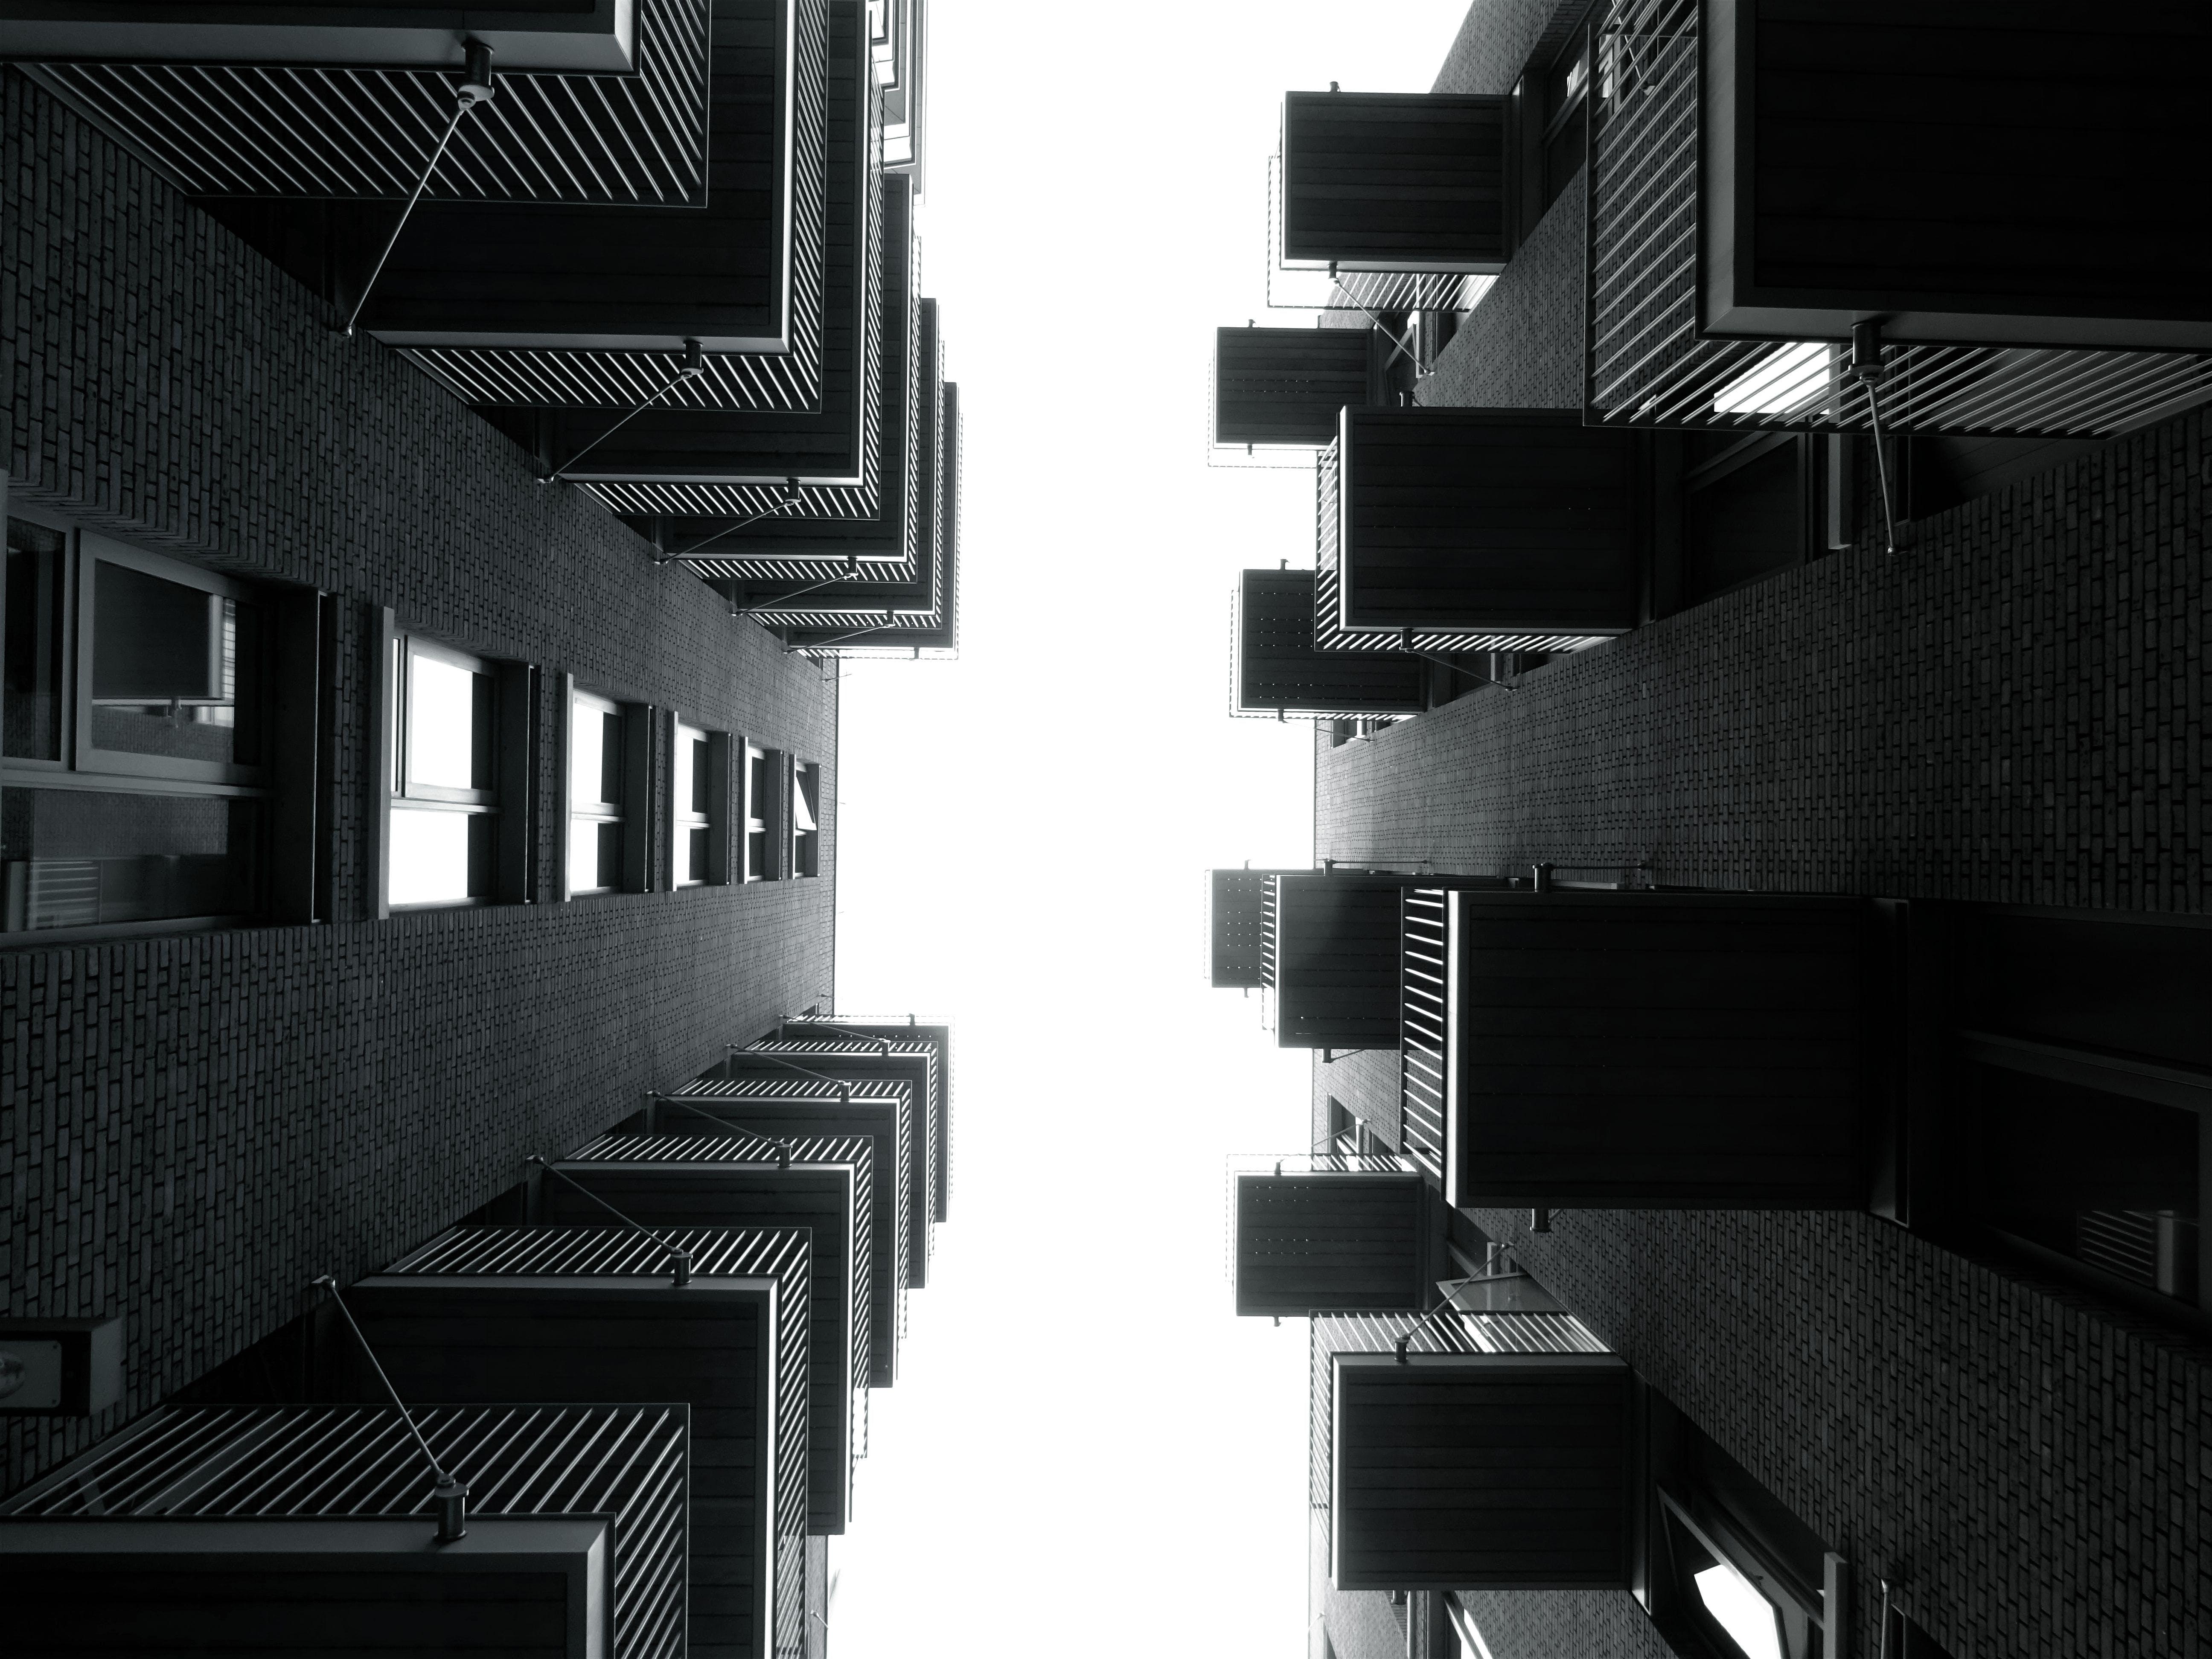 apartments, architecture, balcony